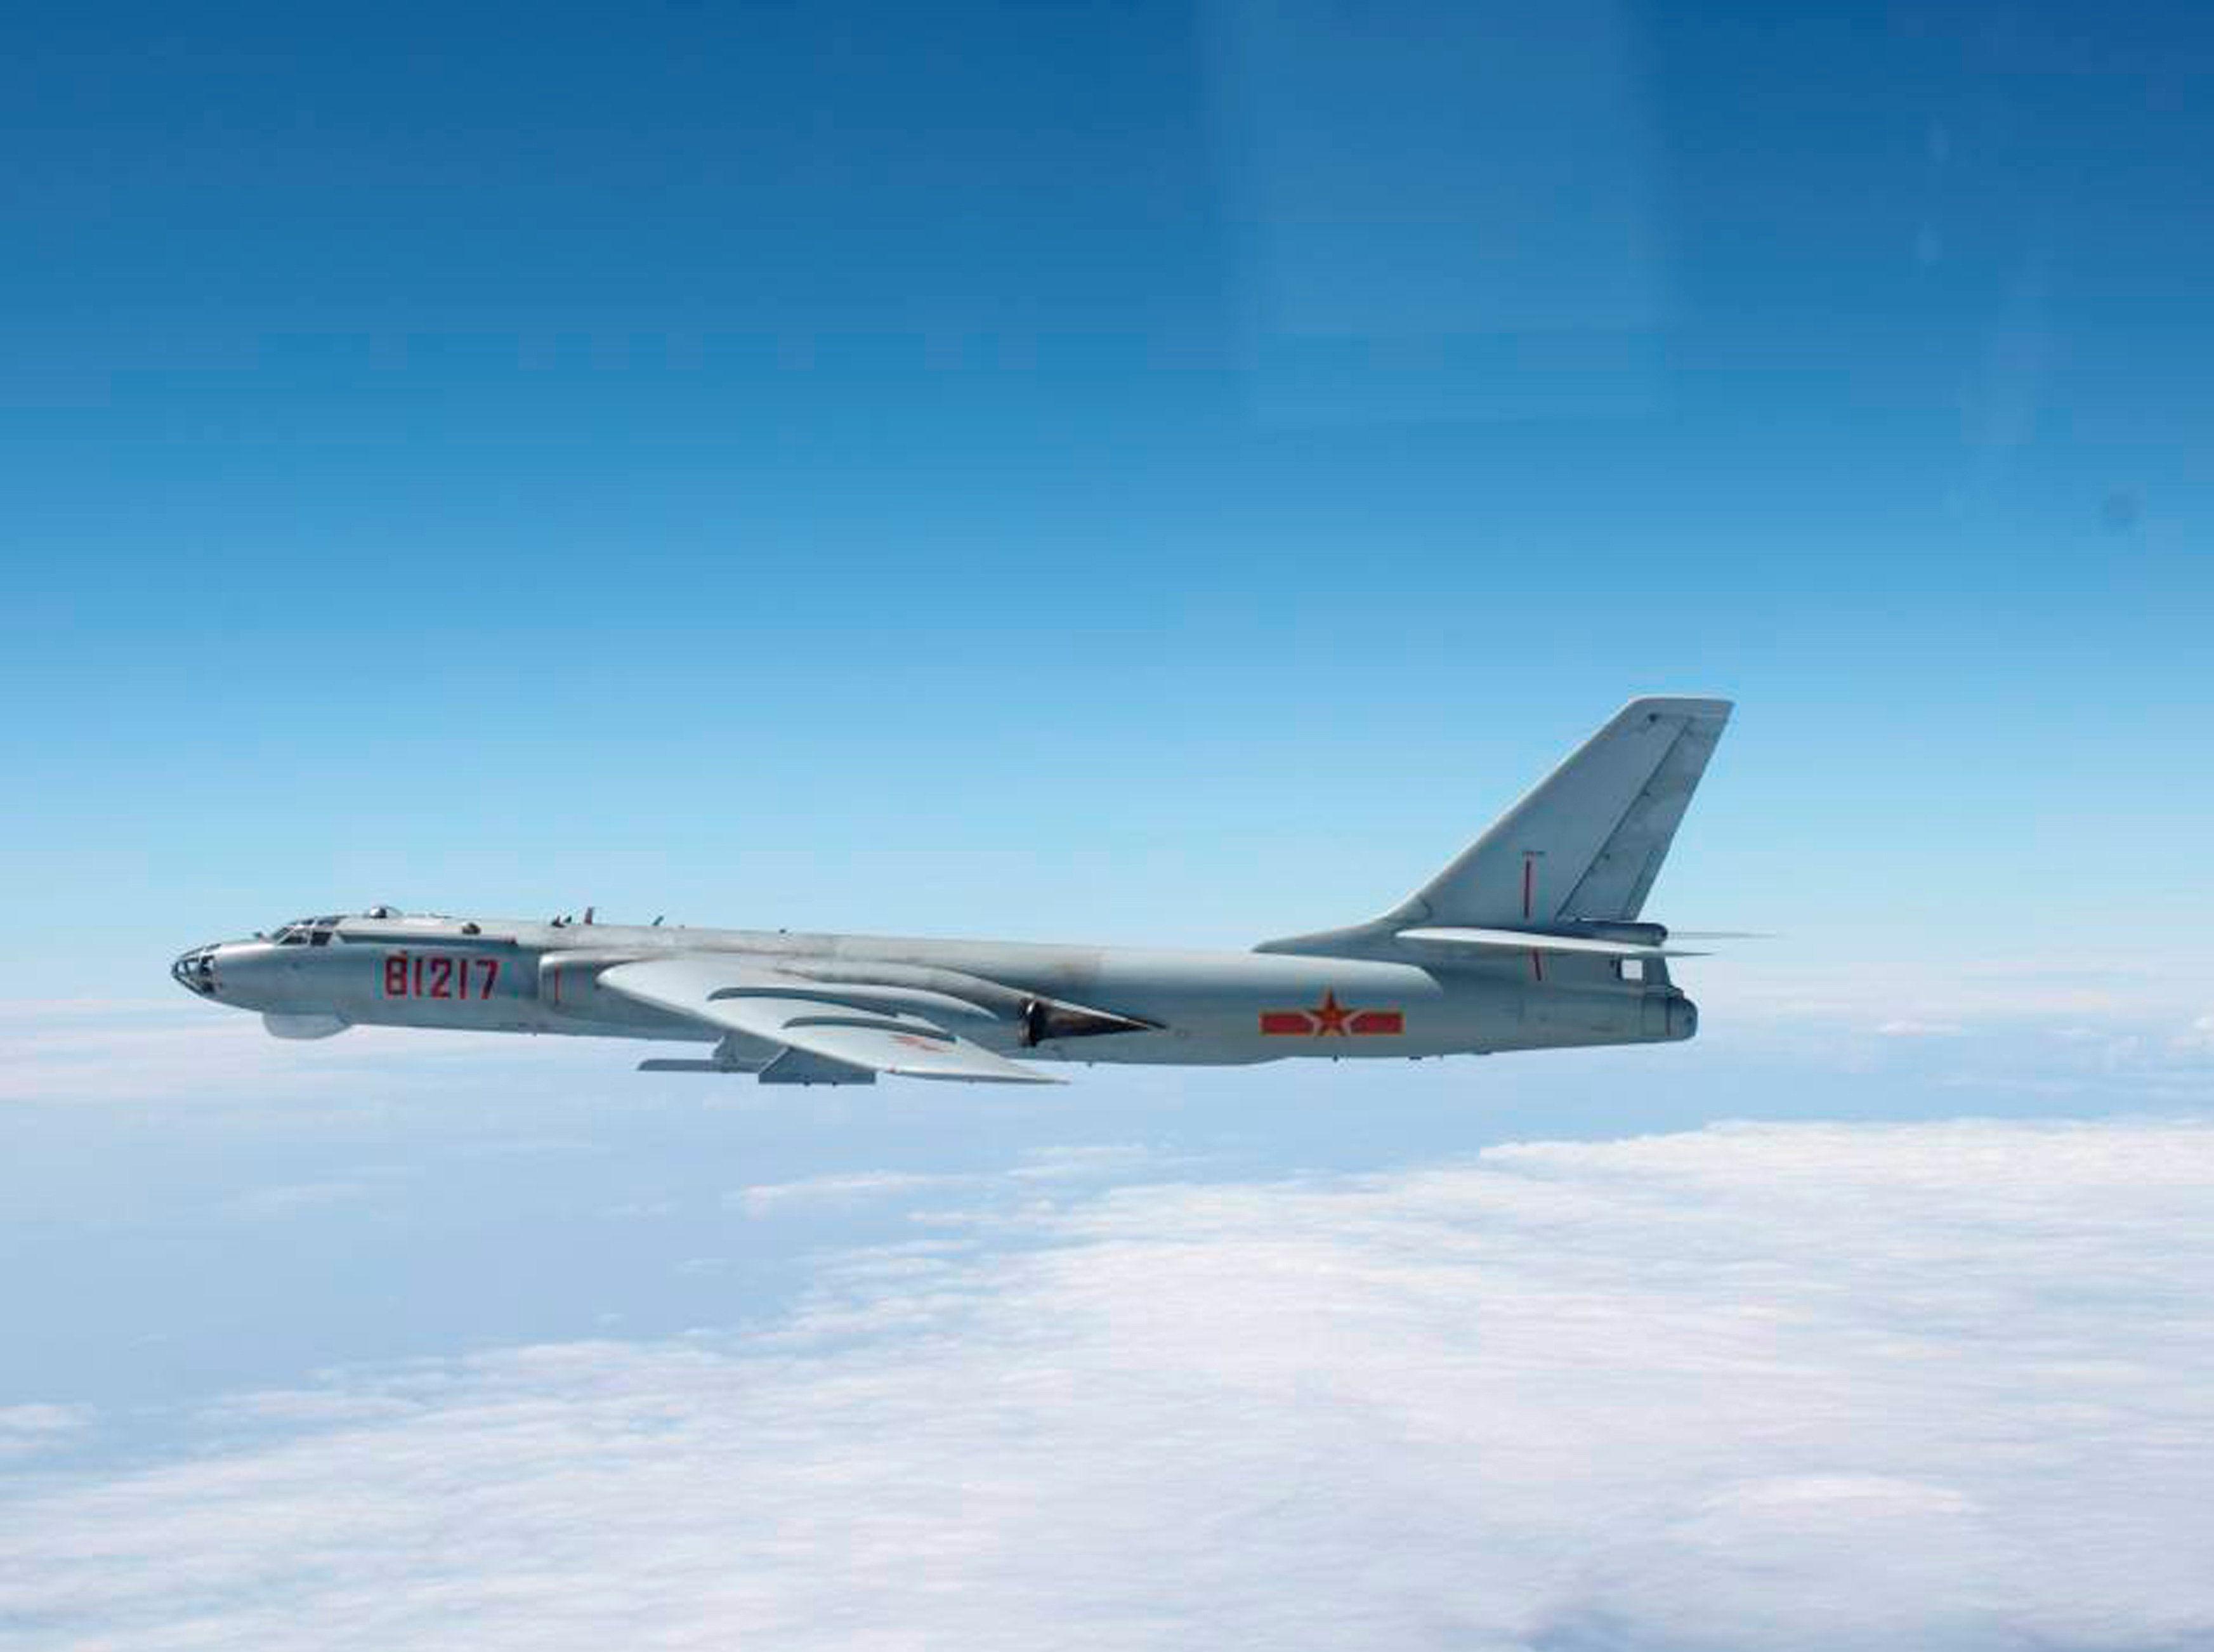 PLA Air Force Xian H-6 Bomber